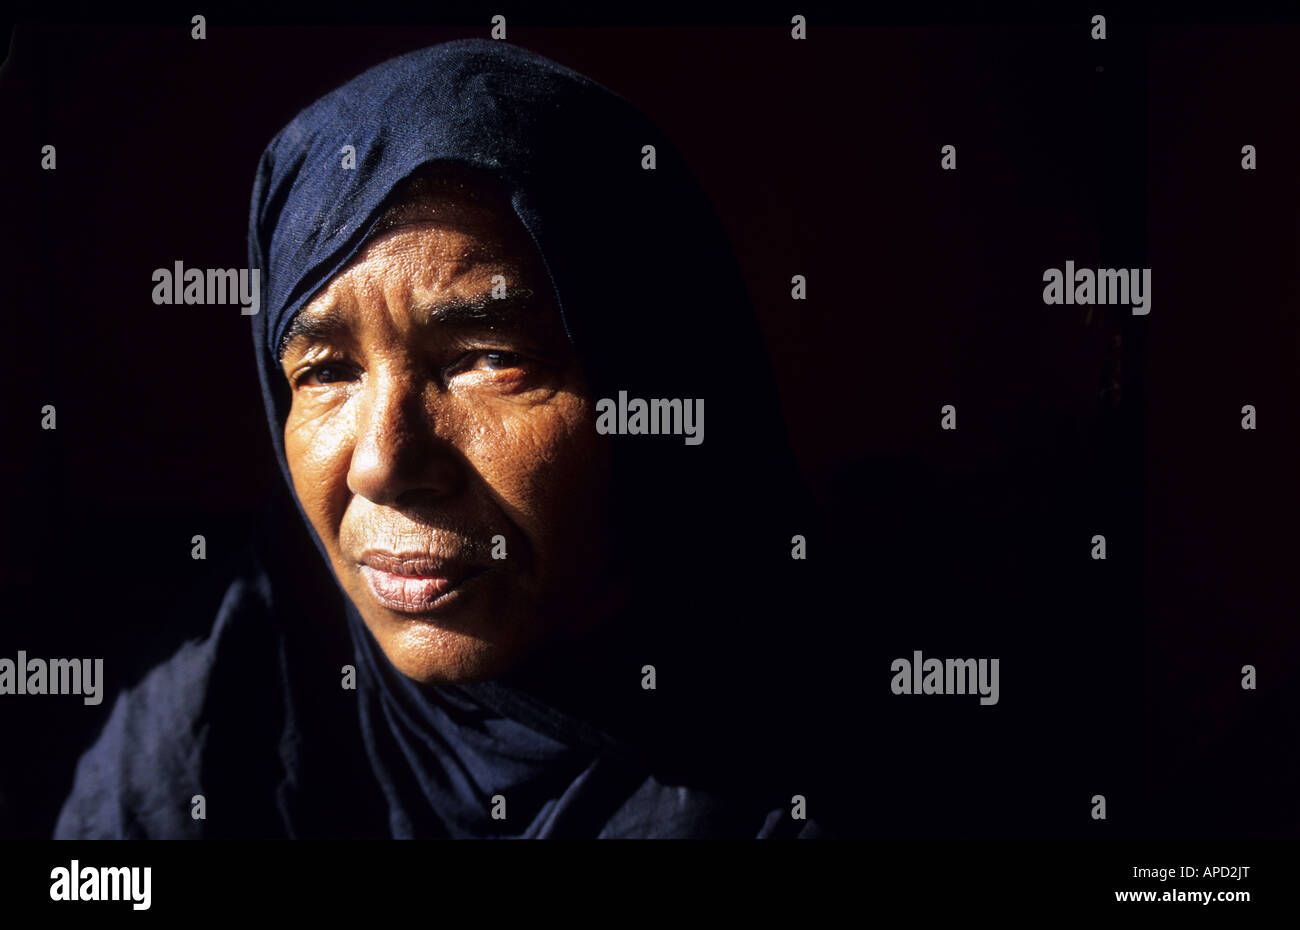 A Saharawi women at the Saharawi refugee camp of Tindouf Algeria photo quintina valero - Stock Image